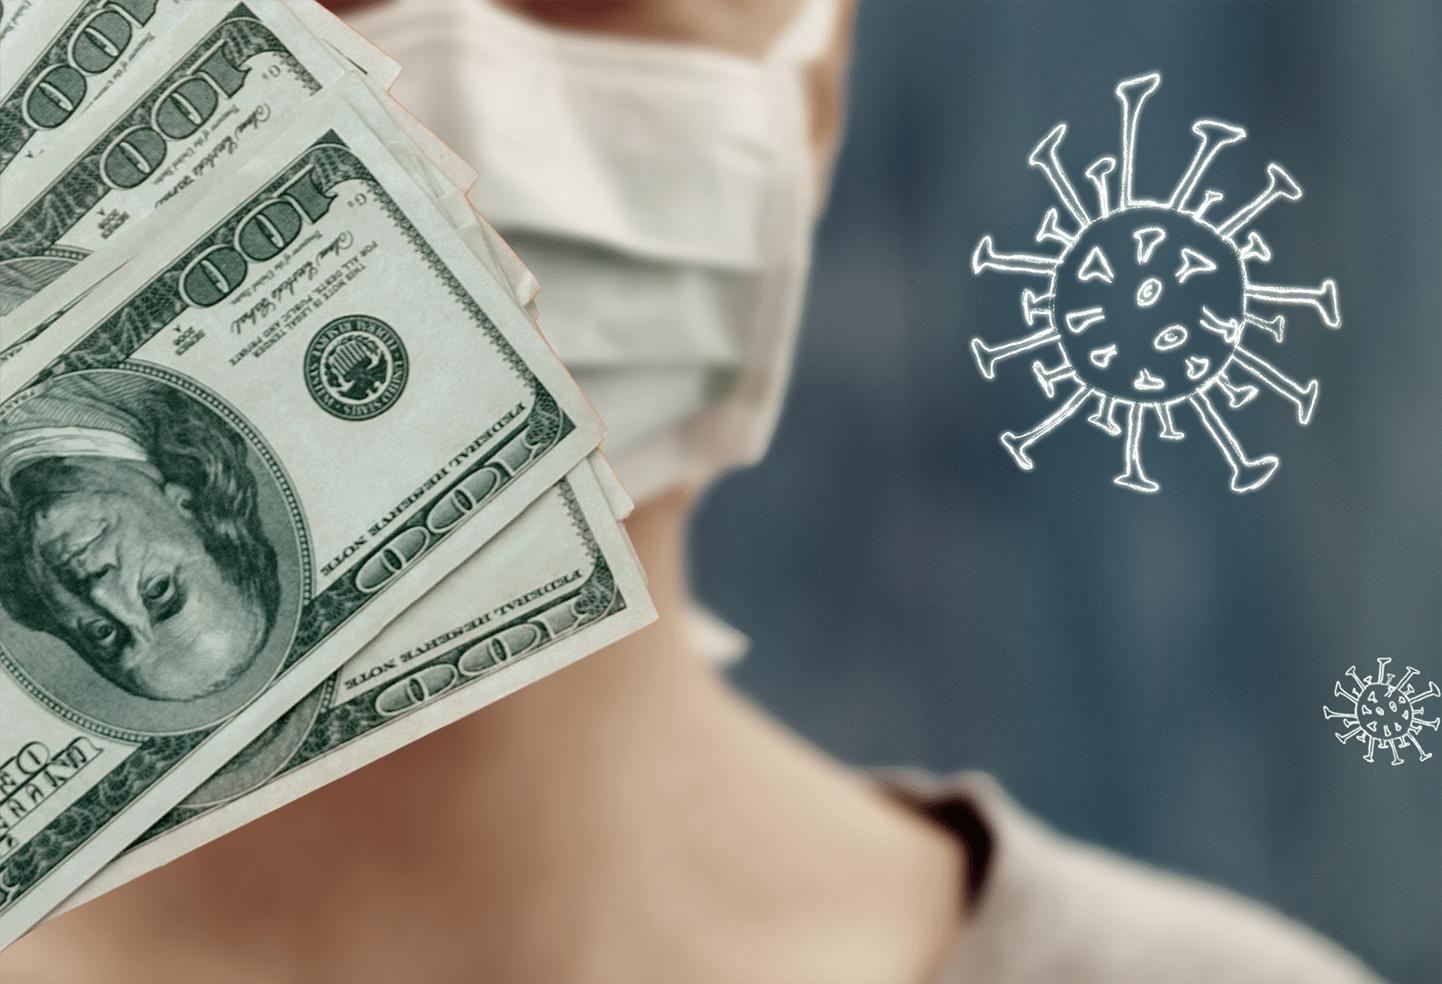 Transfer money, not disease.